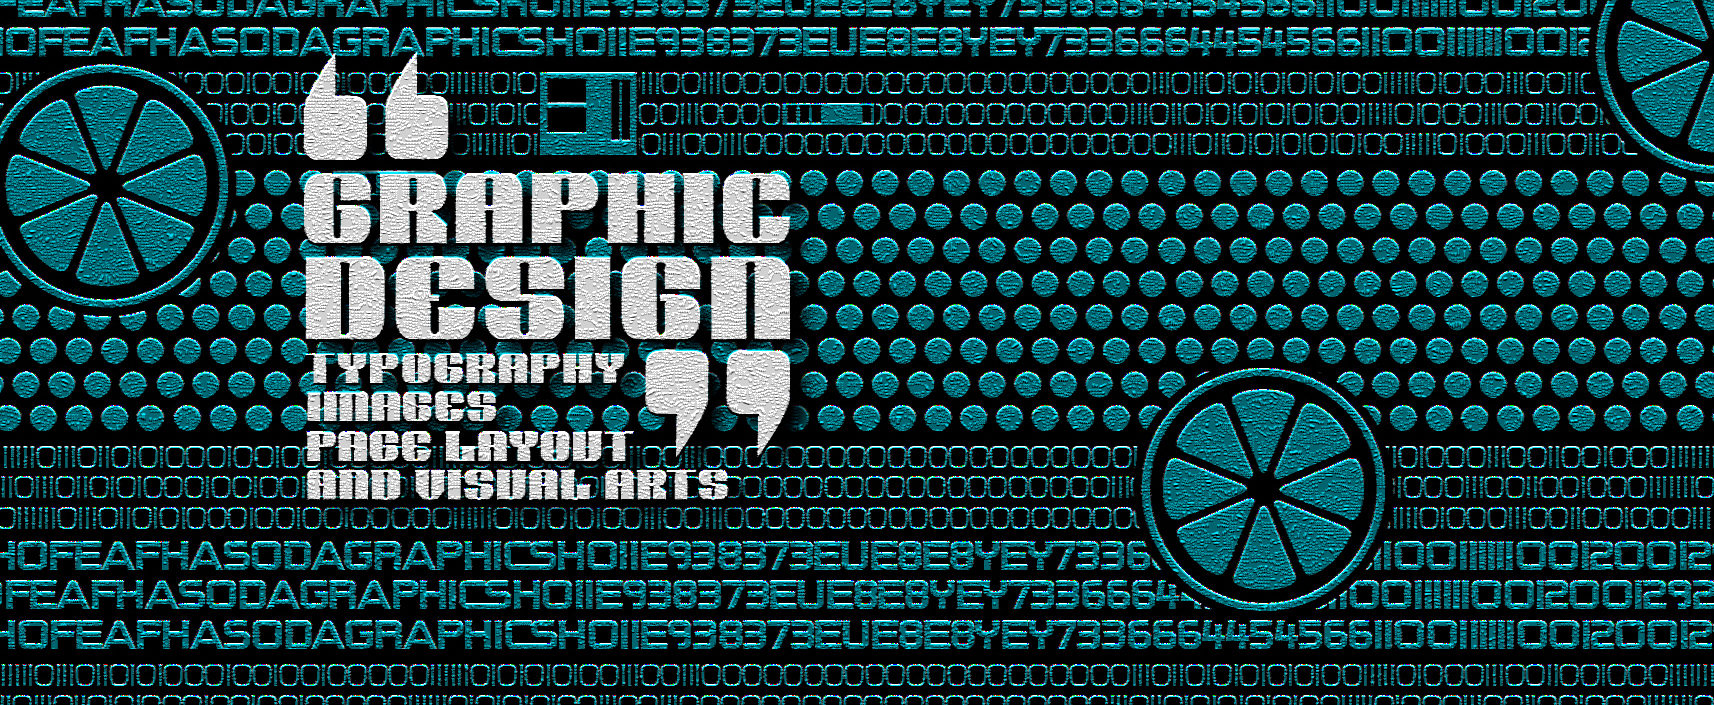 Graphic Design Booklets